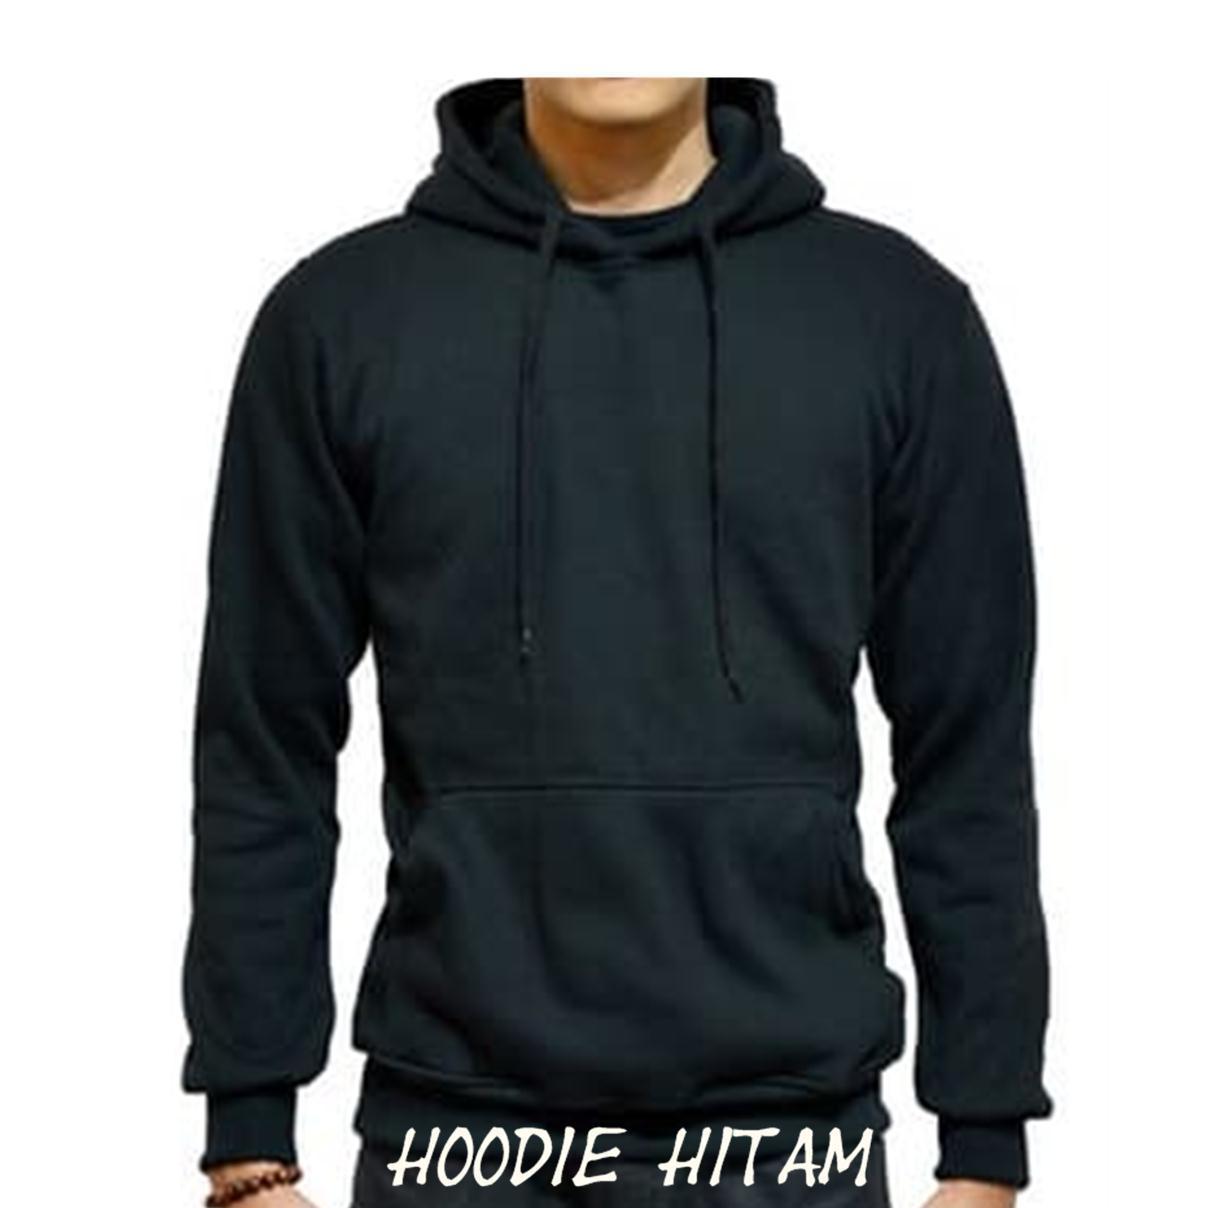 ... Hoodiepolos Jaket Sweater Hoodie Pria Jumper Polos Fleece NON Hitam